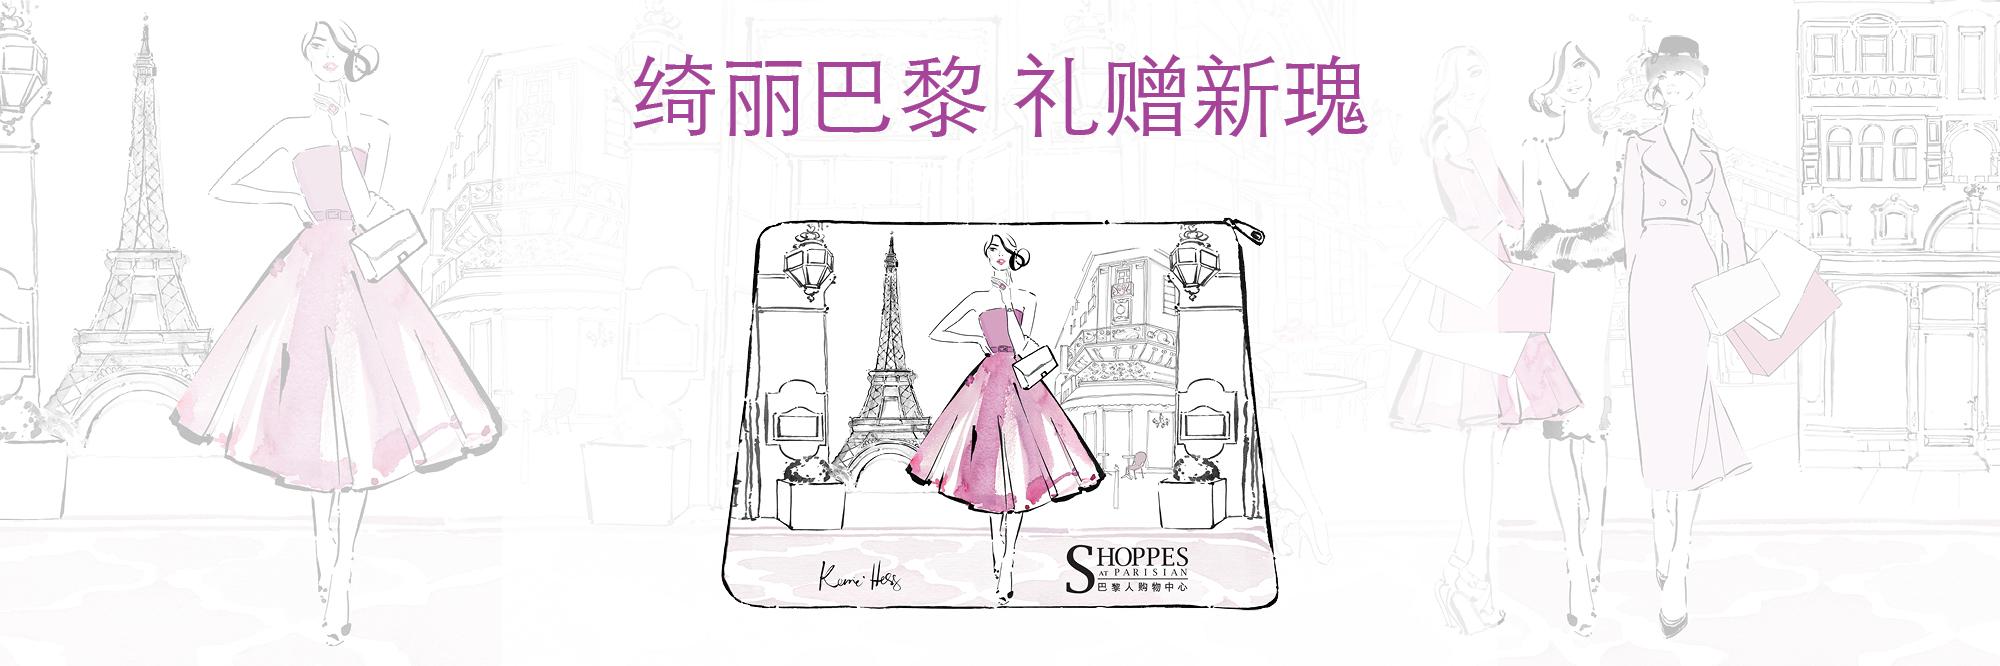 Parisian Macao Your Chic Gift 著名插画师Kerrie Hess绘制限量版化妆袋